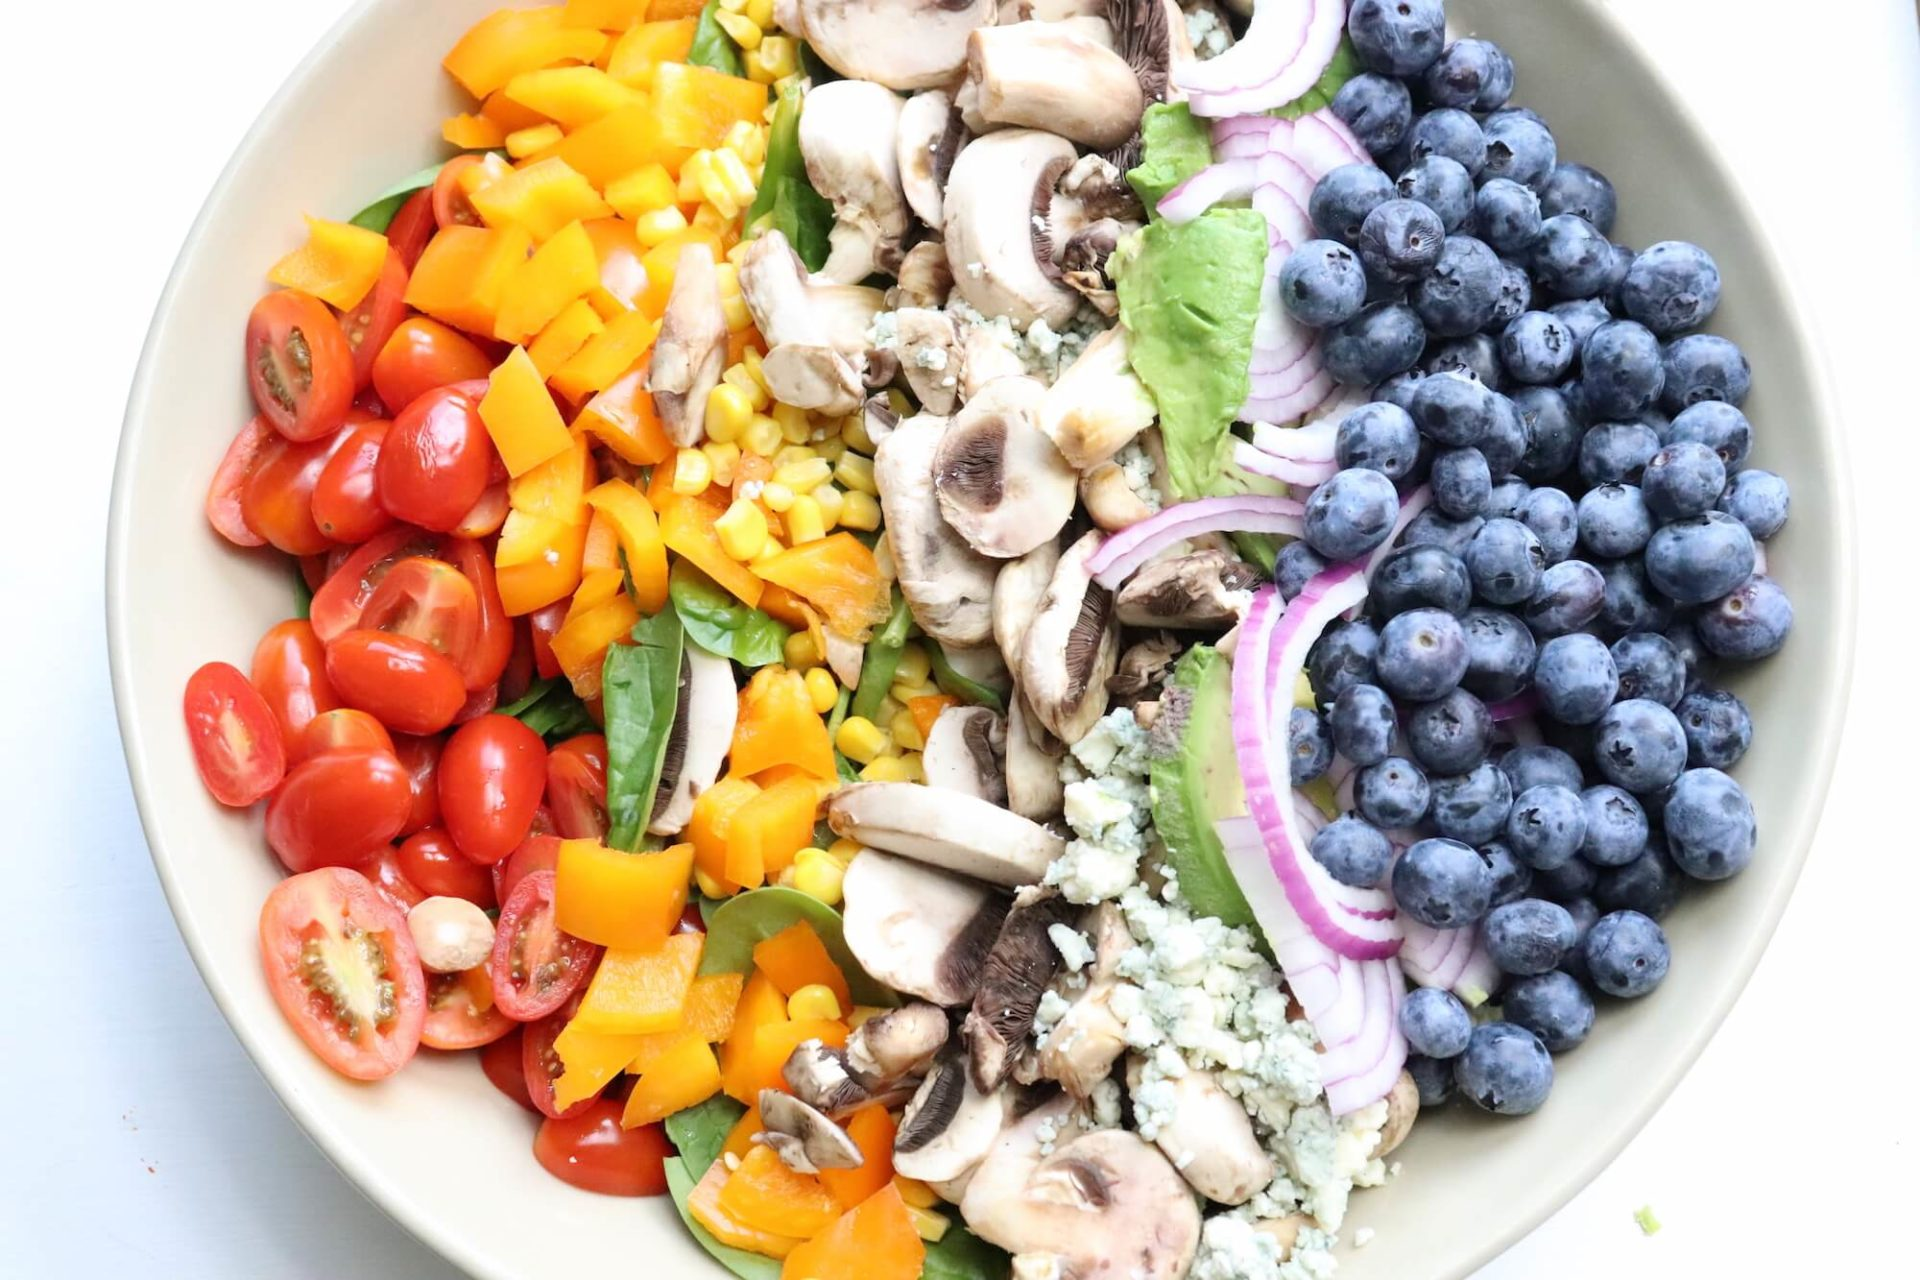 Rainbow Summer Salad with White Mushrooms